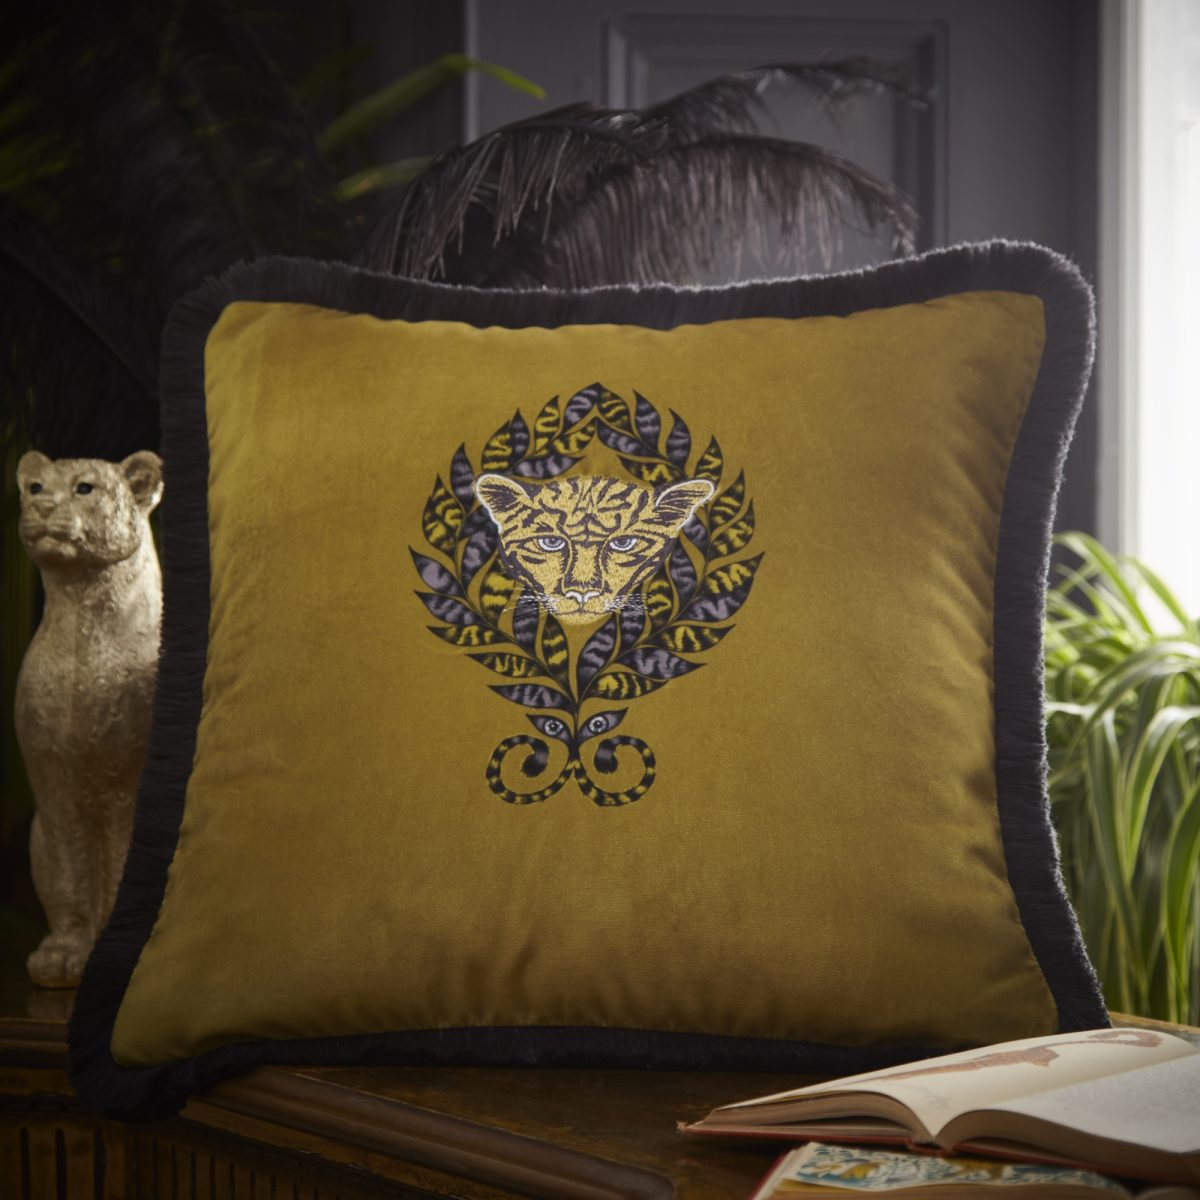 Emma Shippley Amazon Cushion 02 No Usm